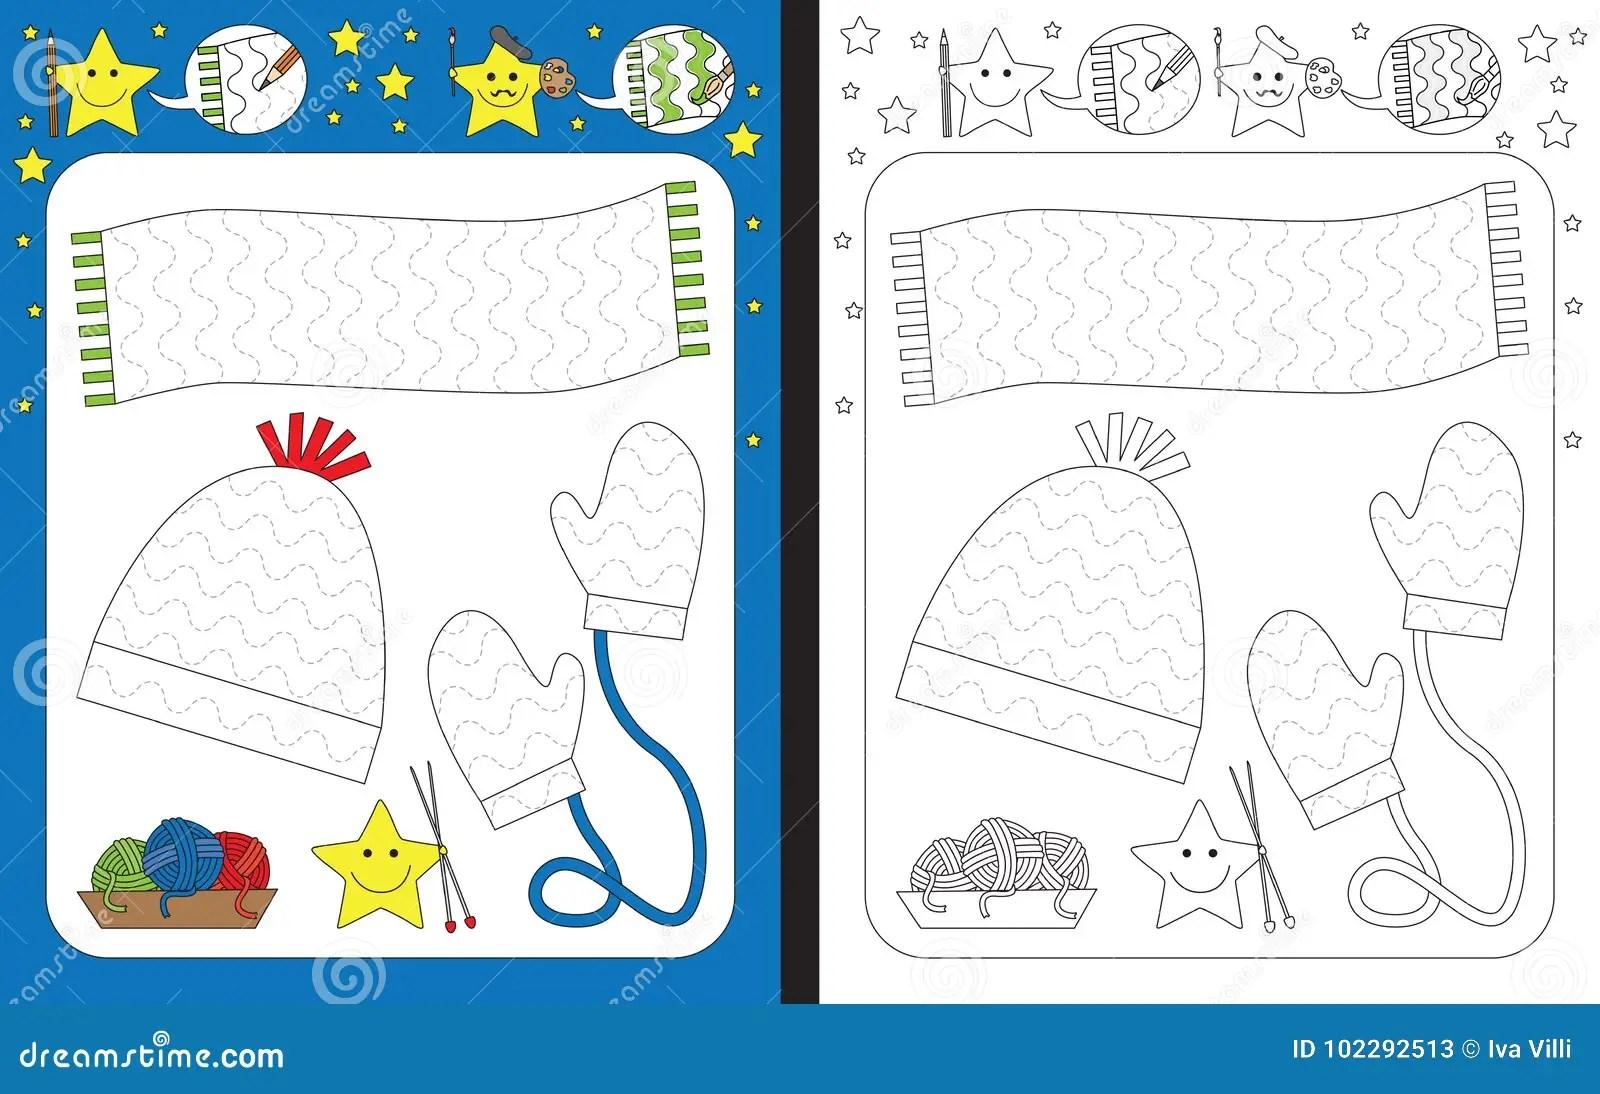 Preschool Worksheet Stock Vector Illustration Of Outlined